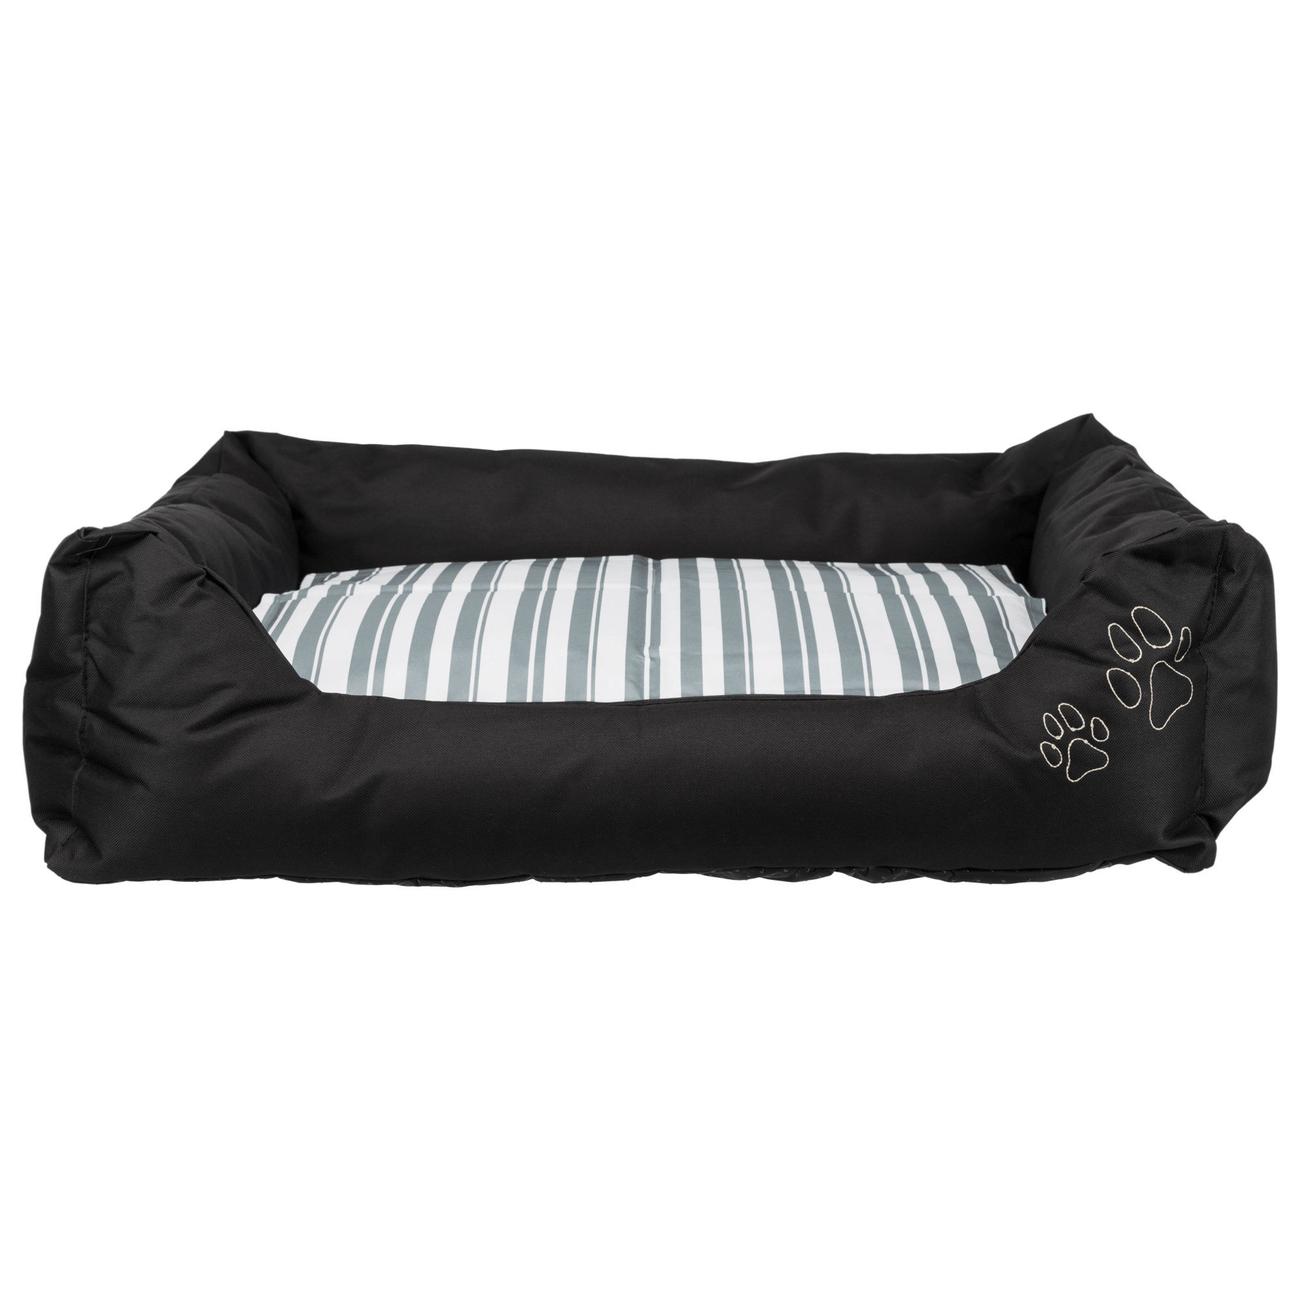 TRIXIE Hunde Kühlmatte Stripes Bild 3